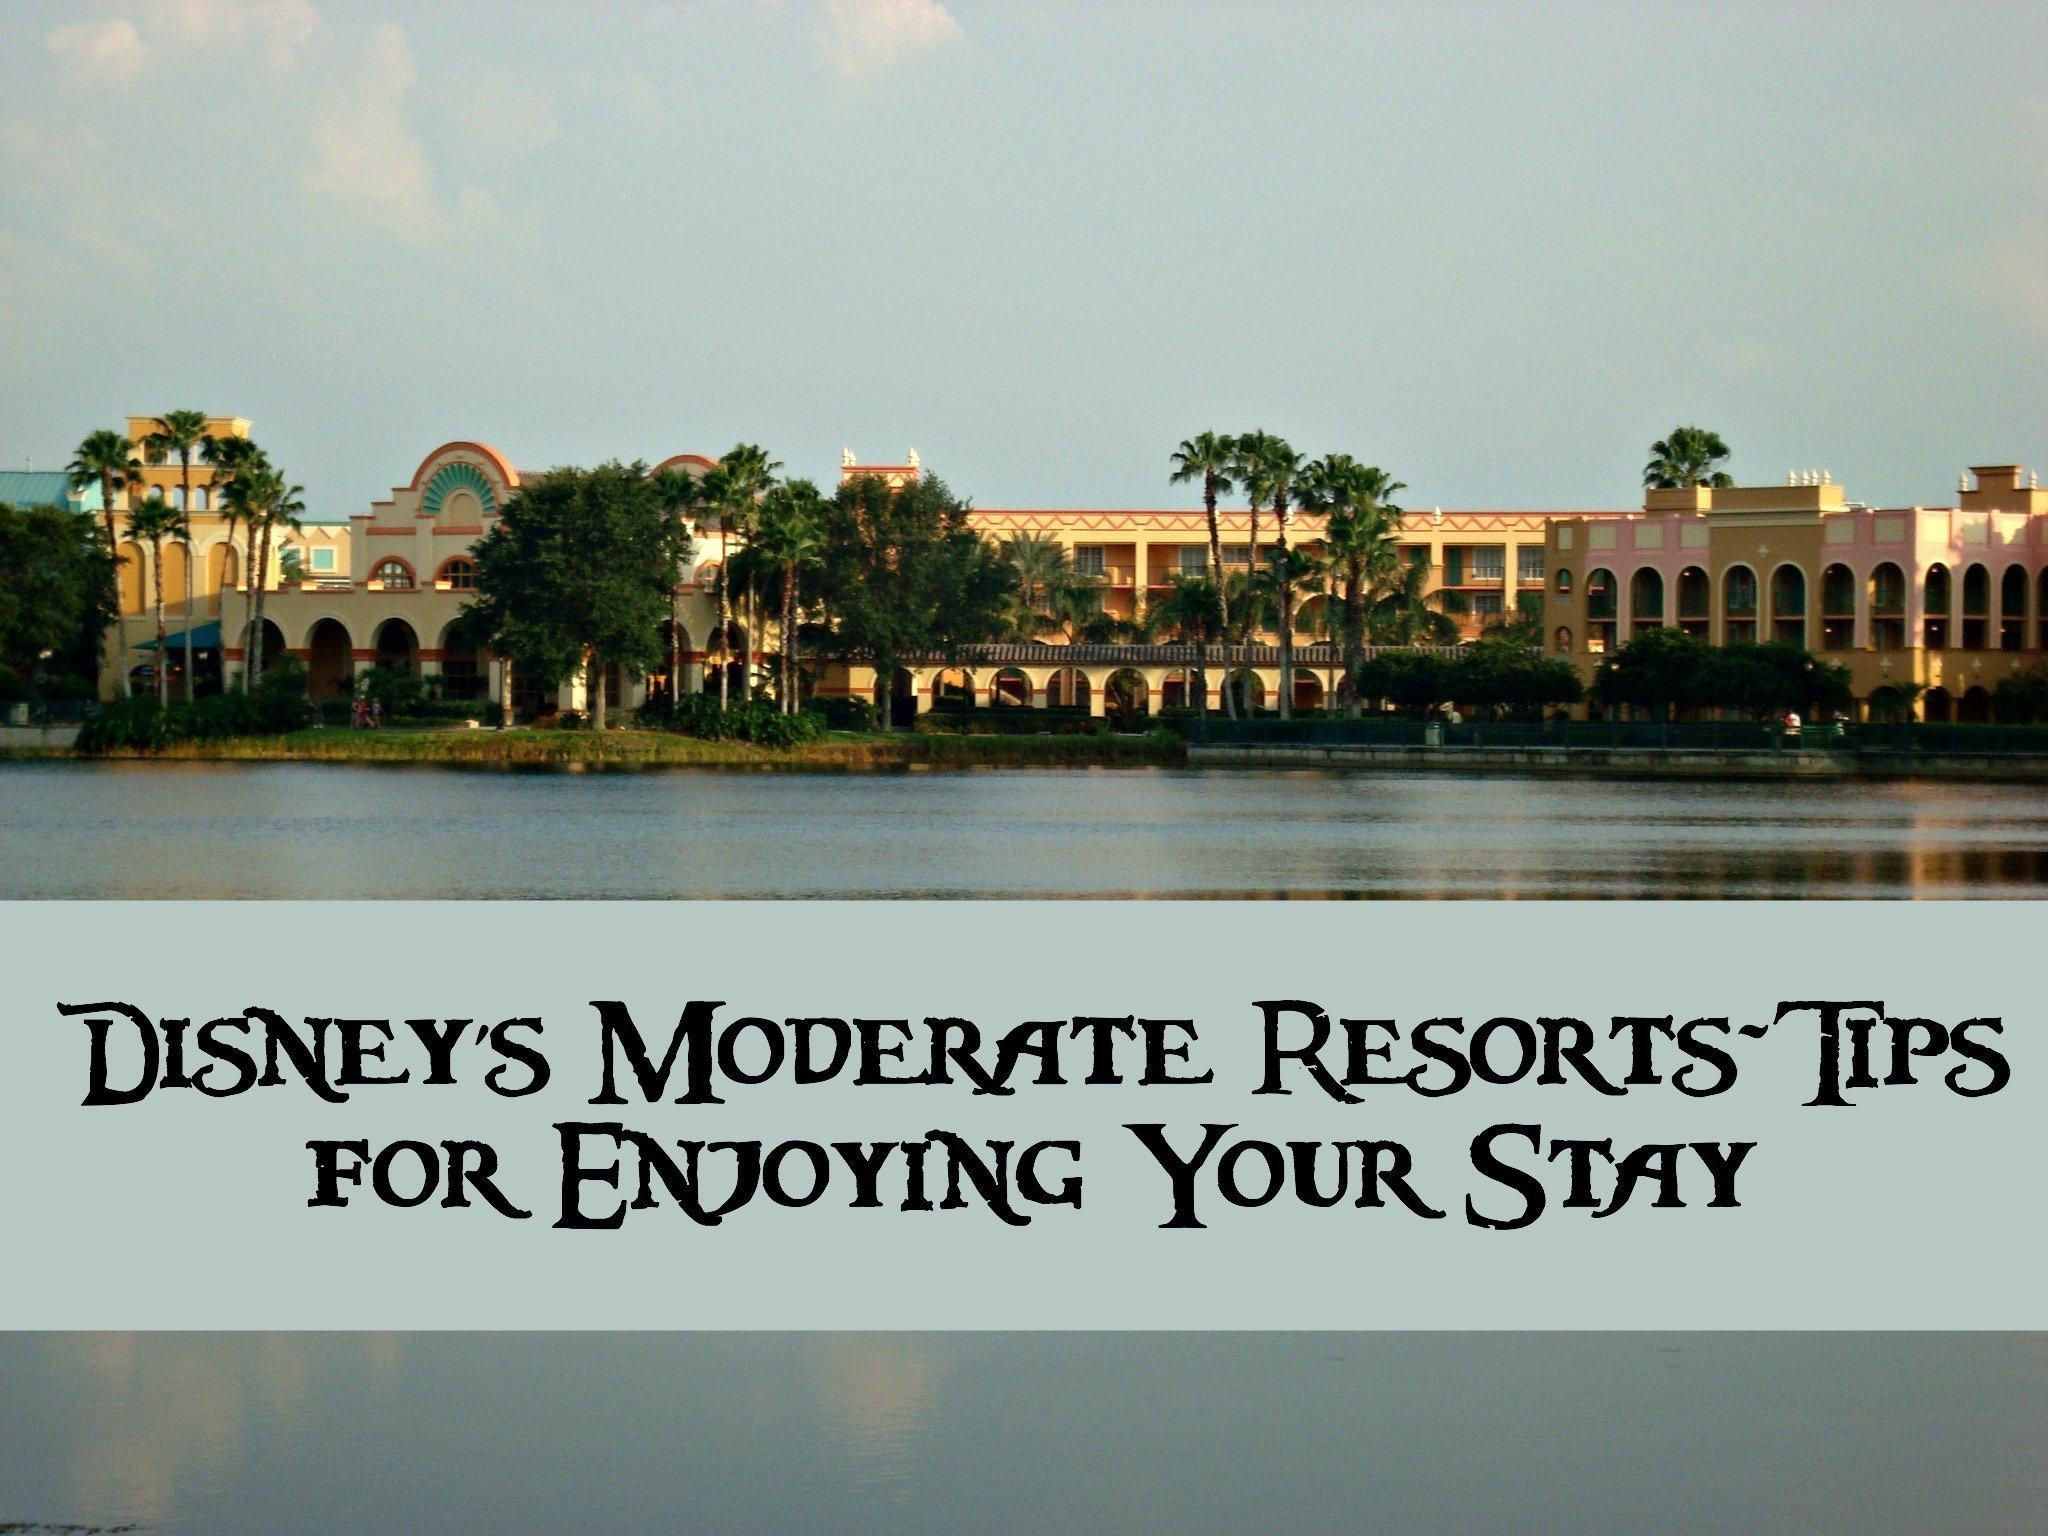 Disney's Moderate Resorts-Tips for Enjoying These Popular Disney Resorts